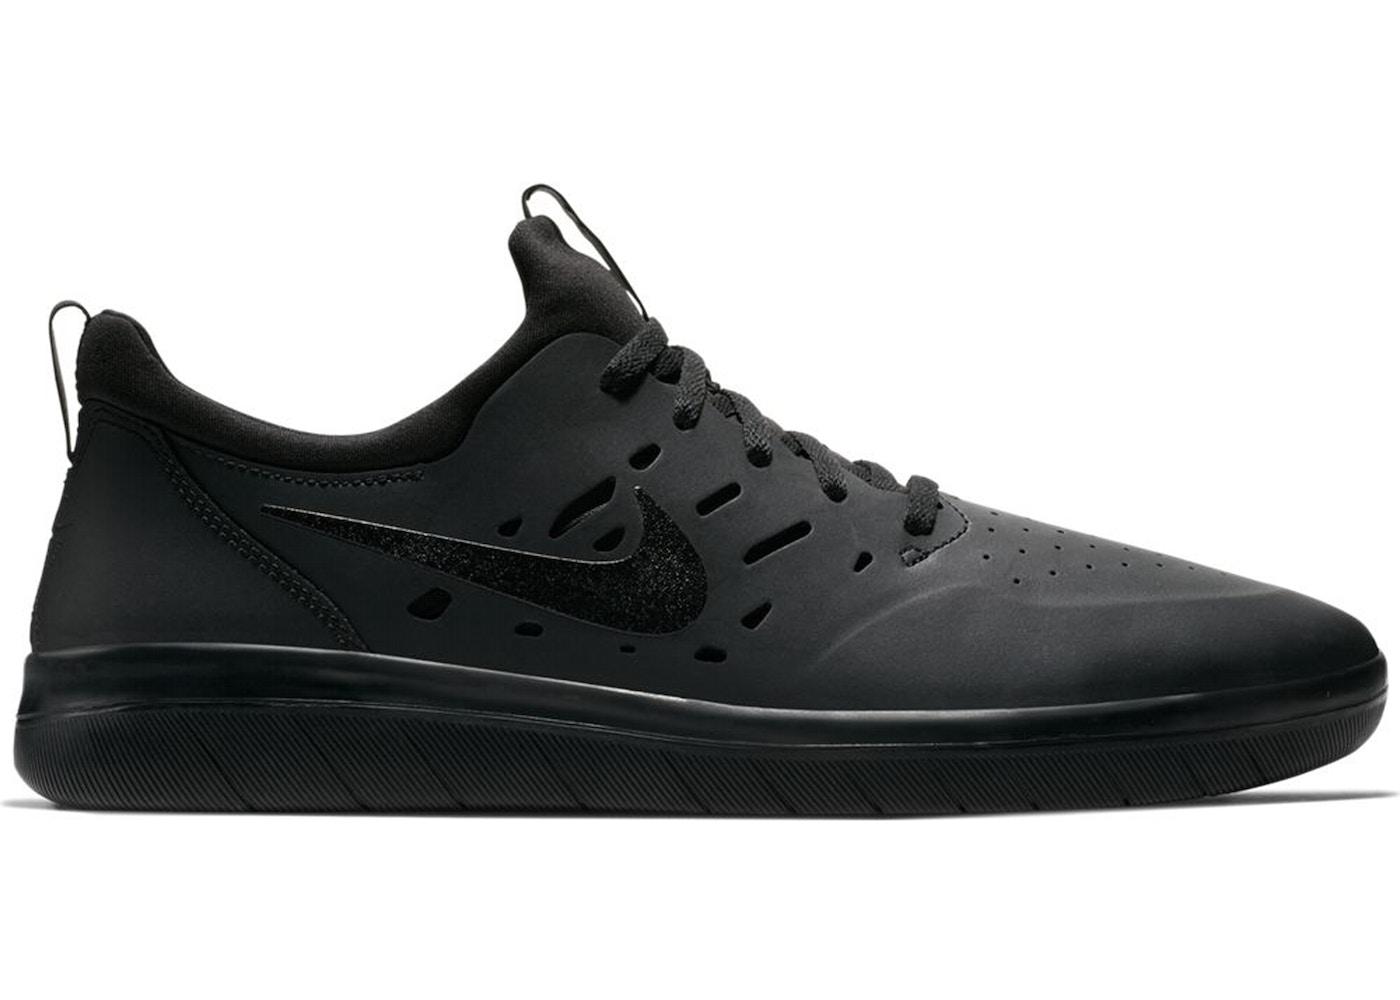 cda7b8f6a869 Nike SB Nyjah Free Triple Black - AA4272-003